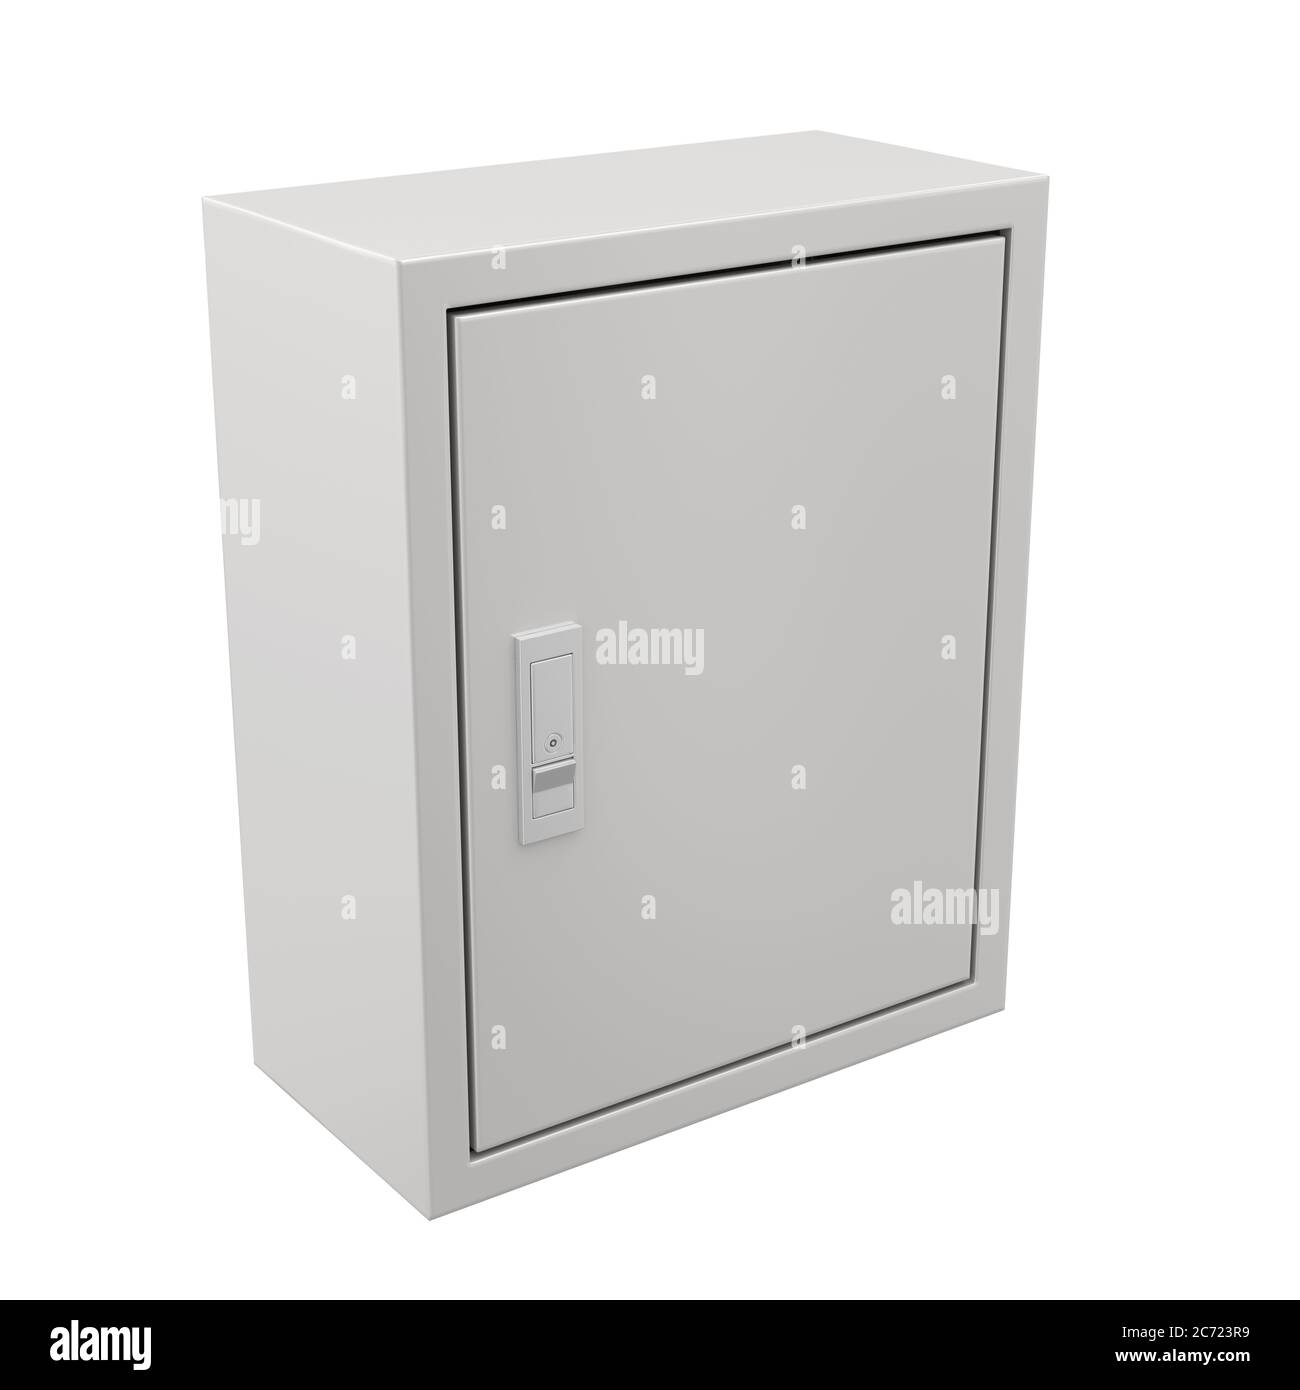 Fuse Box Isolated Stock Photo